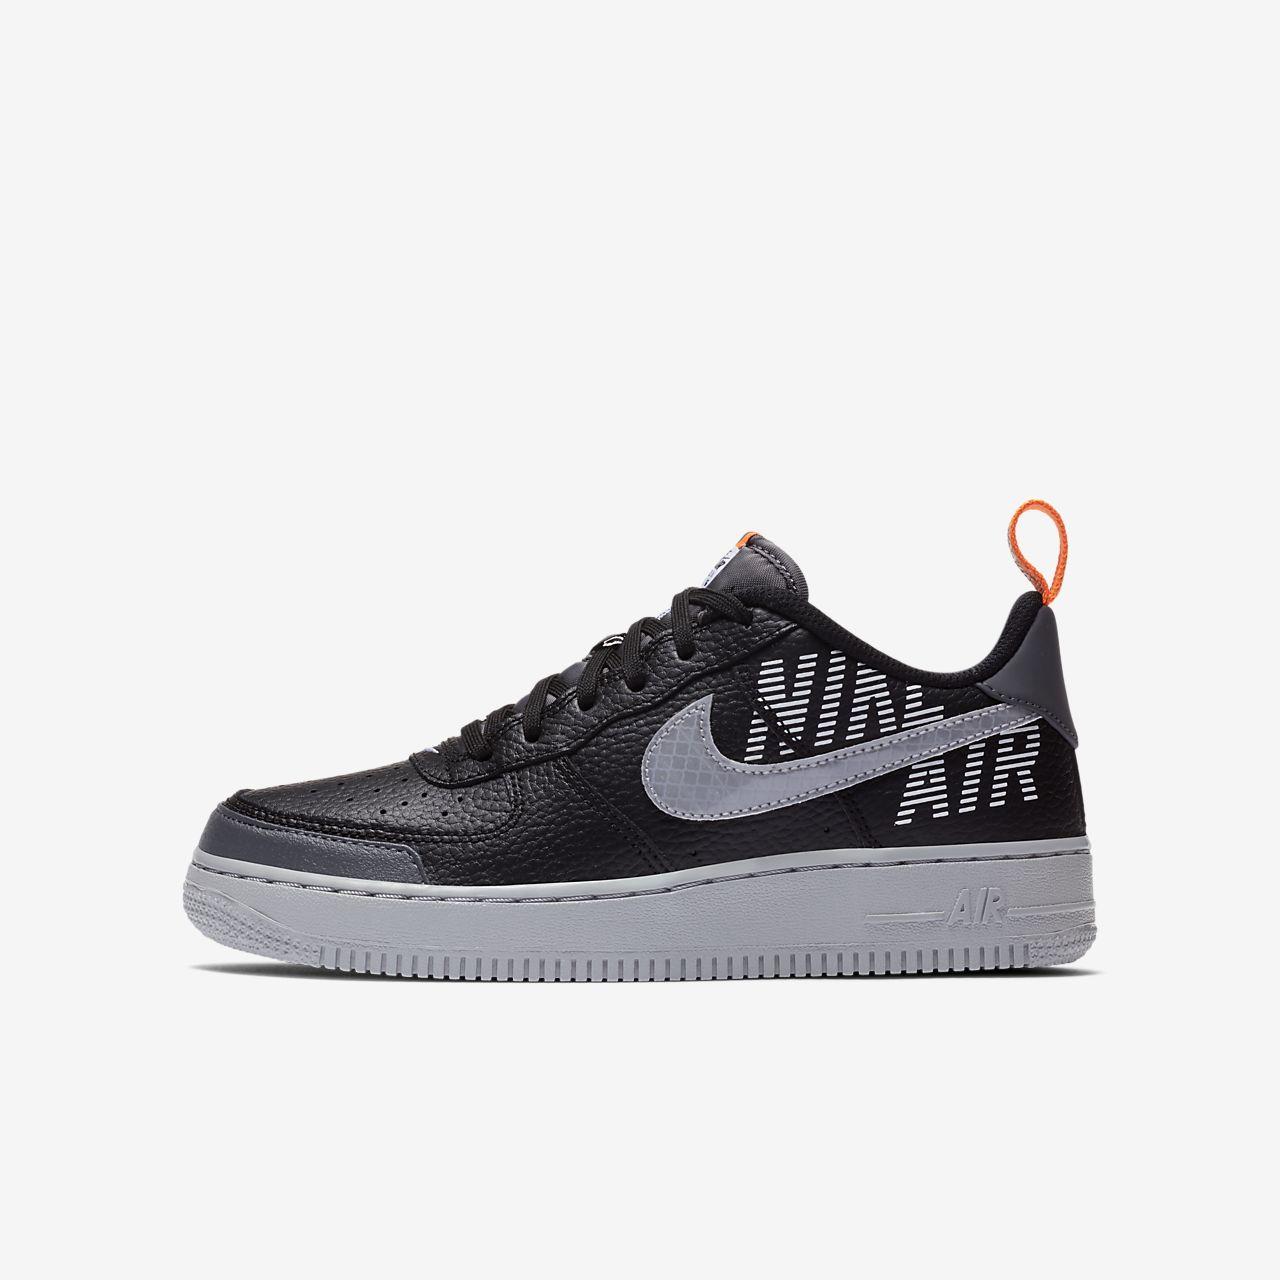 nike scarpe air force 1 lv8 2